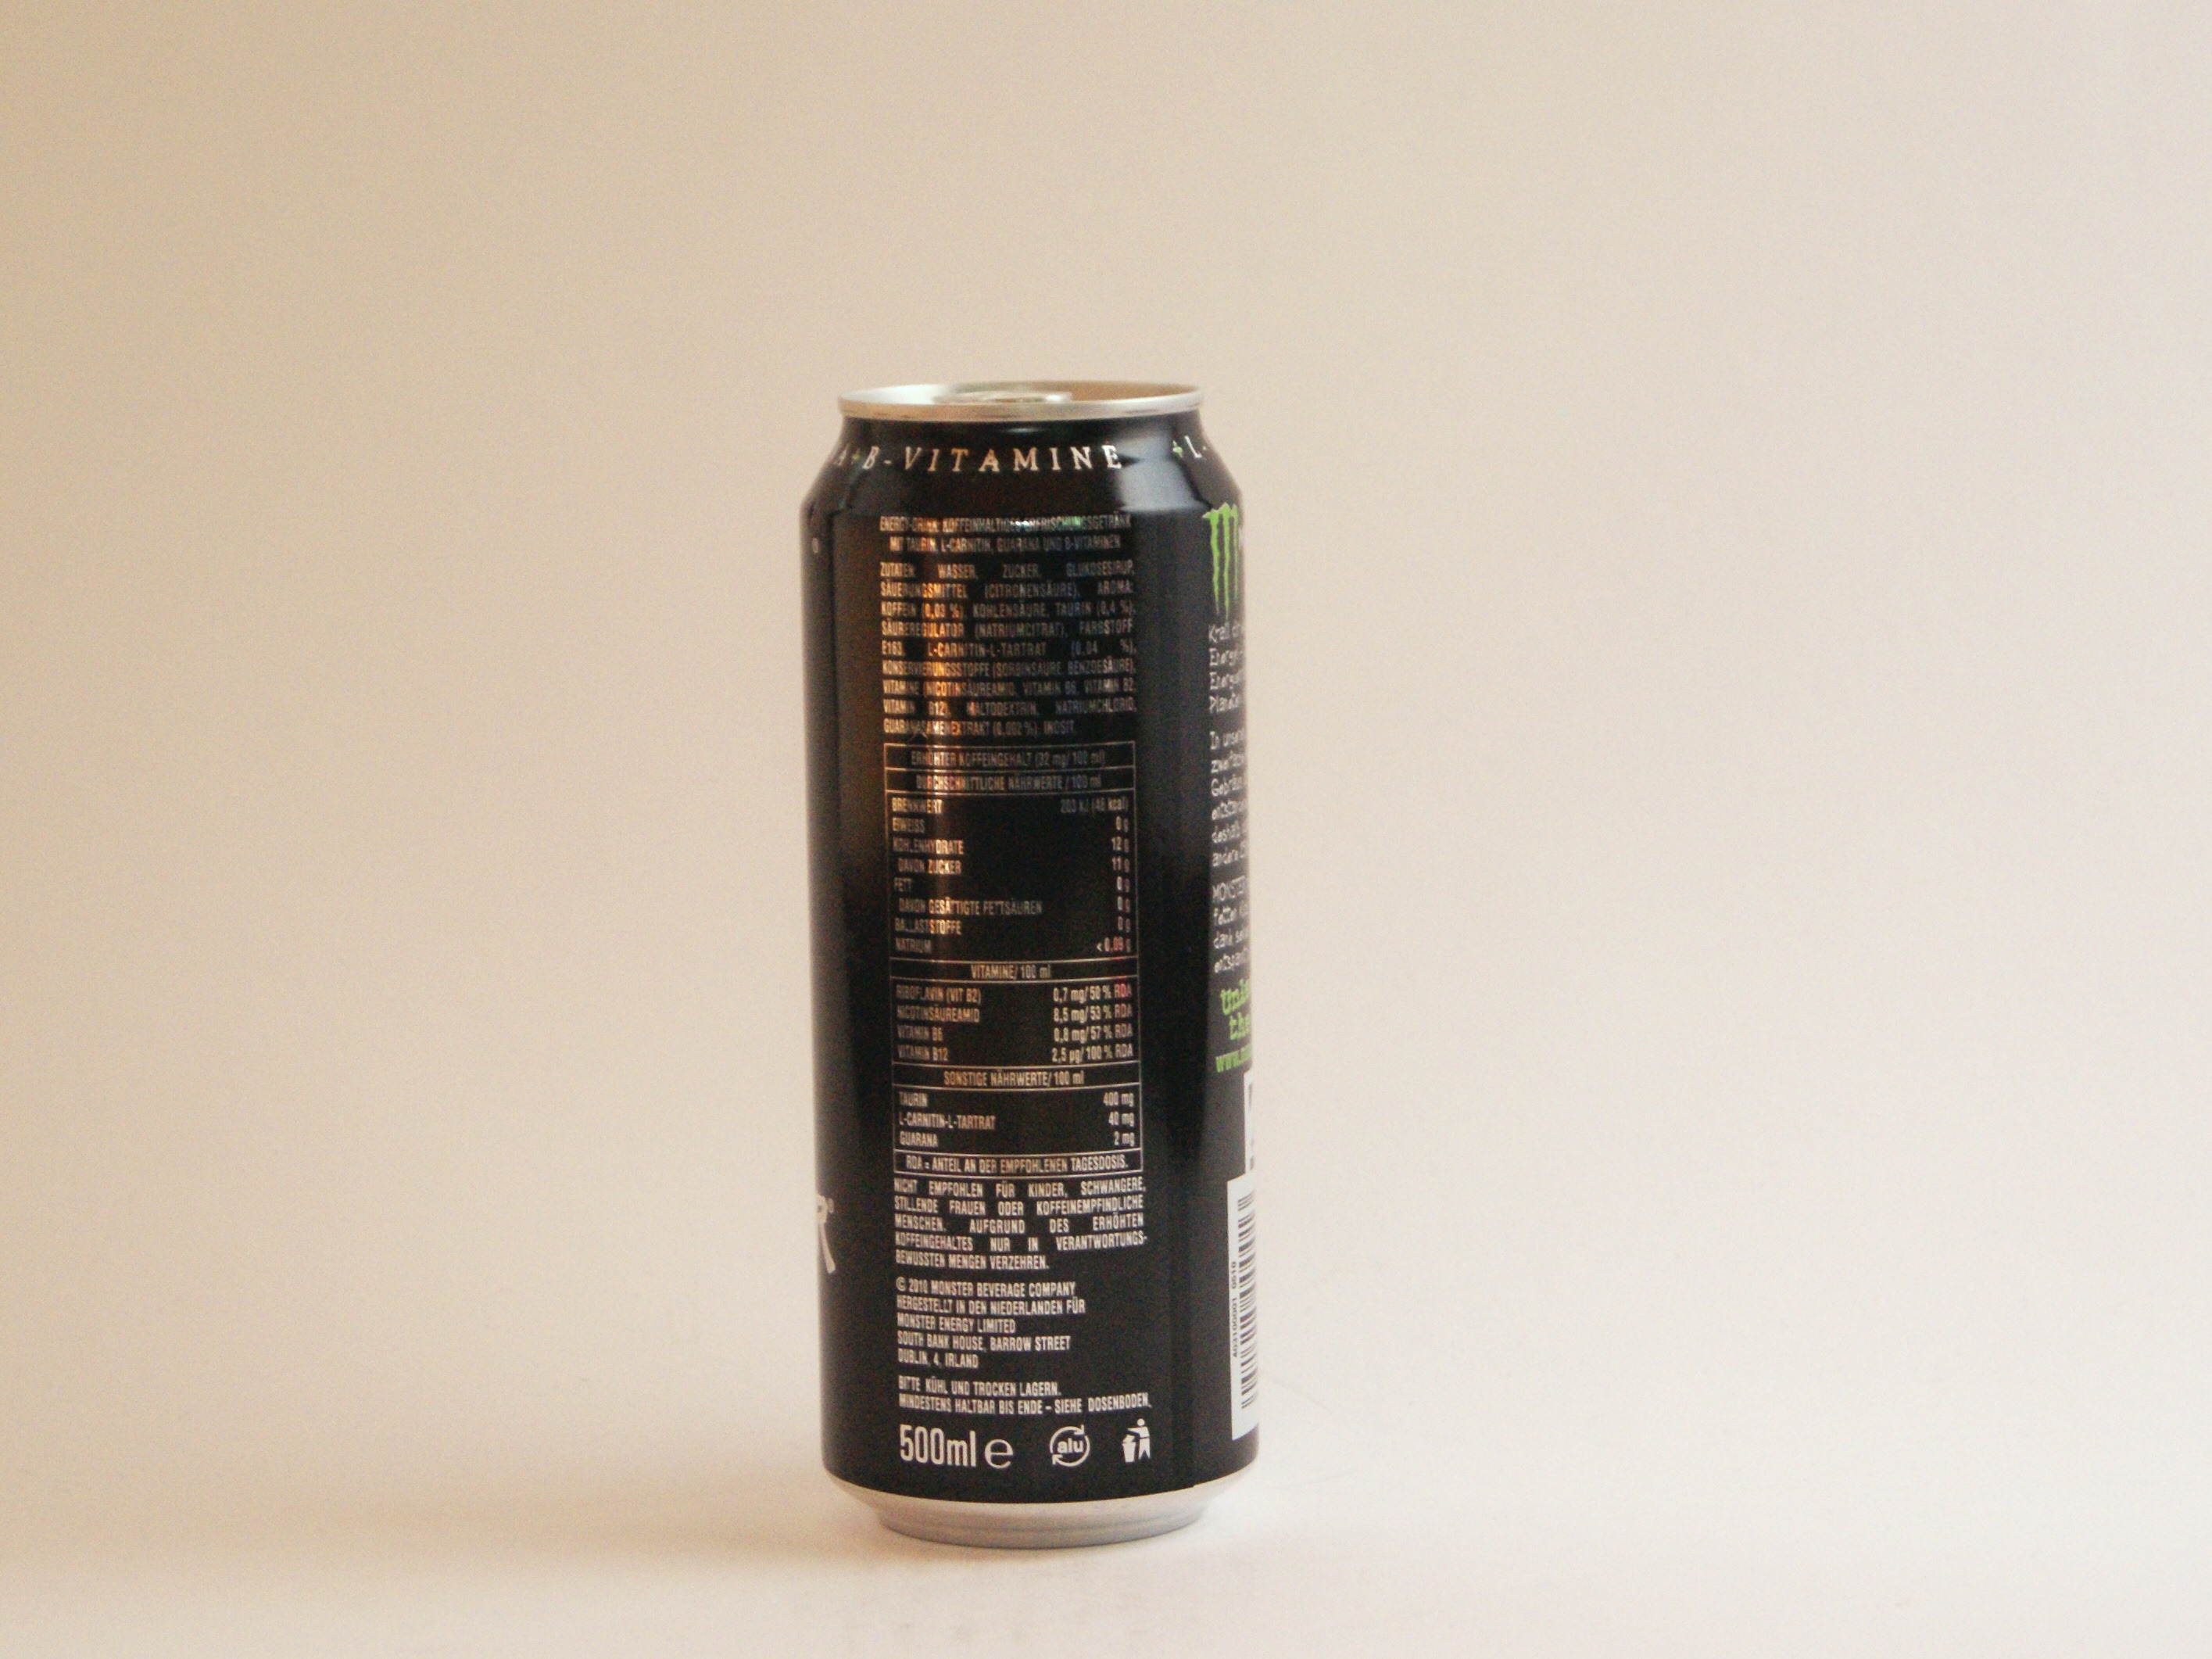 Mini Kühlschrank Red Bull Dose : Dosen kühlschrank monster kühlschrank aufbewahrungsbox